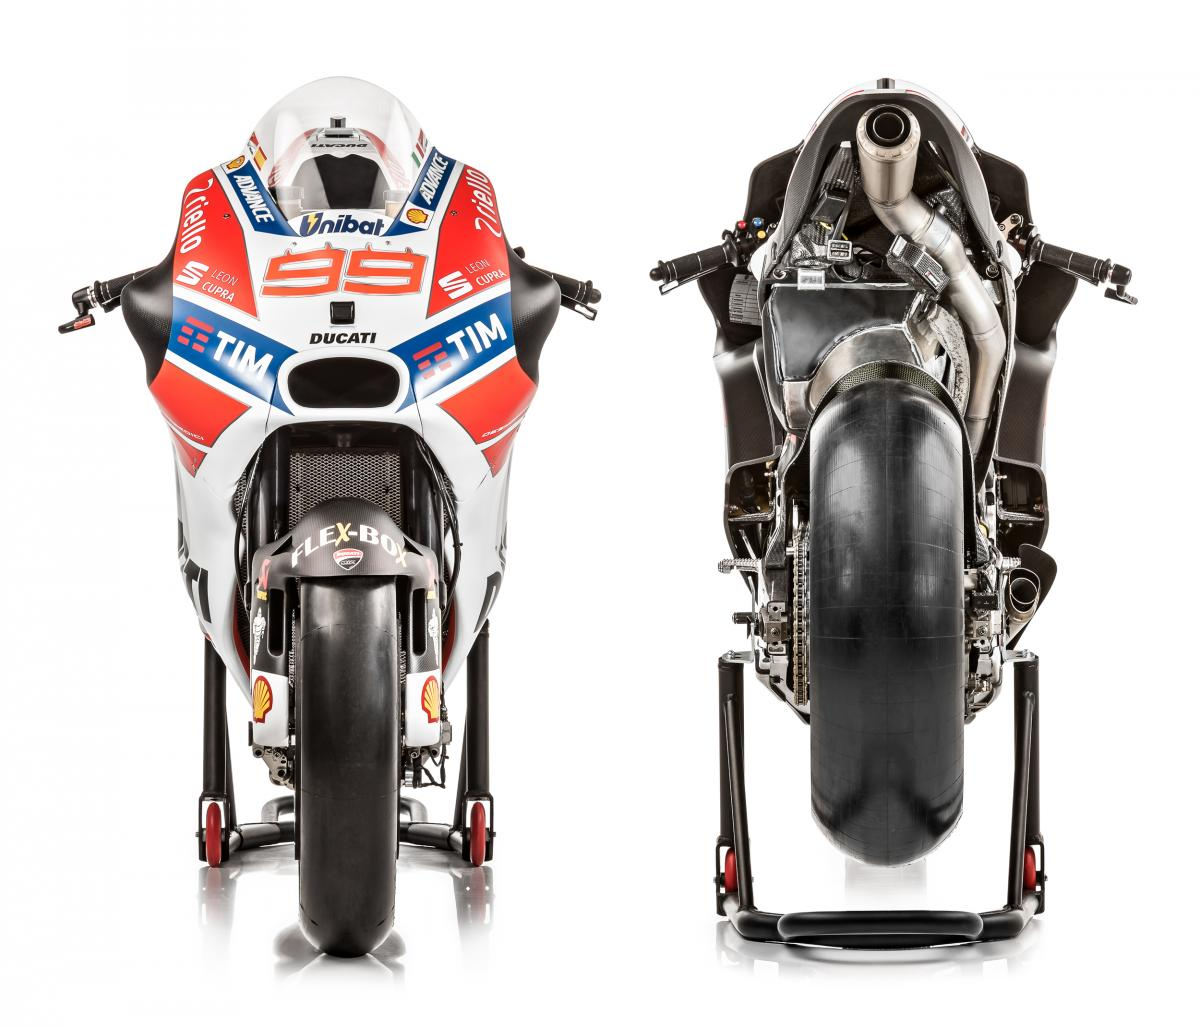 2017 Ducati Factory Team Launch